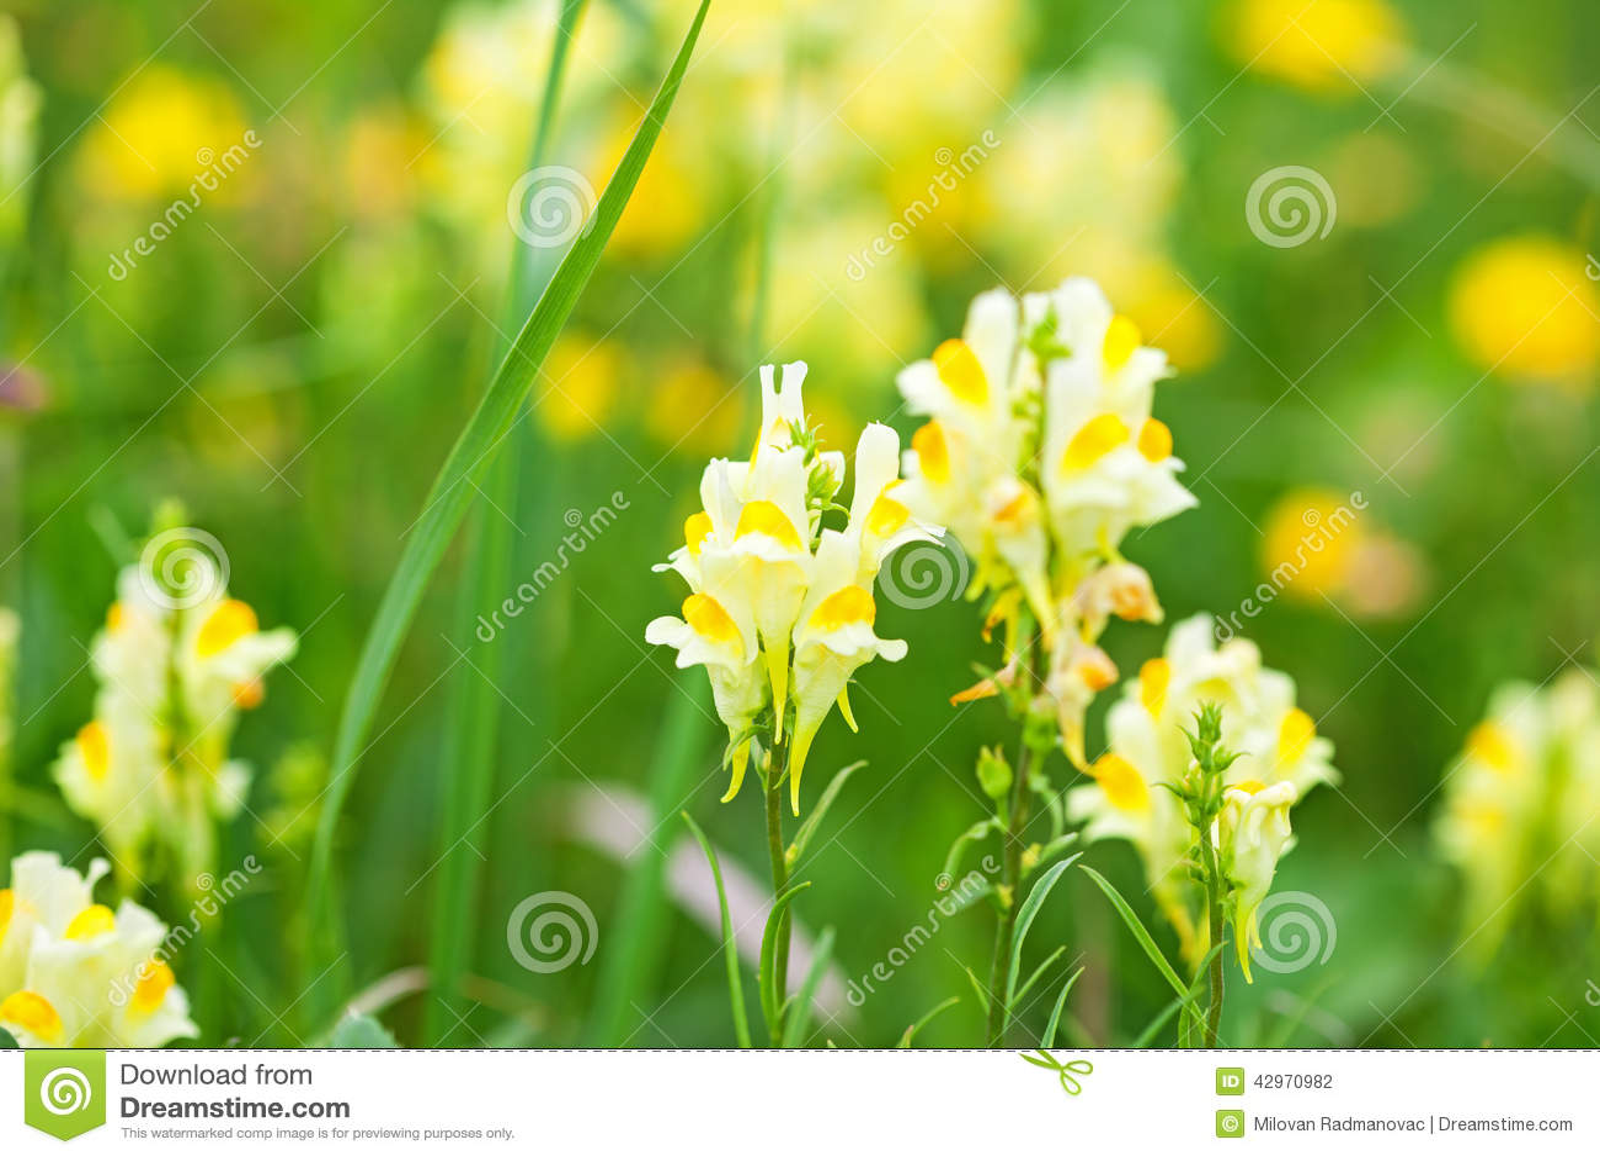 fleurs sauvages jaunes photo stock image du lame ressort 42970982. Black Bedroom Furniture Sets. Home Design Ideas